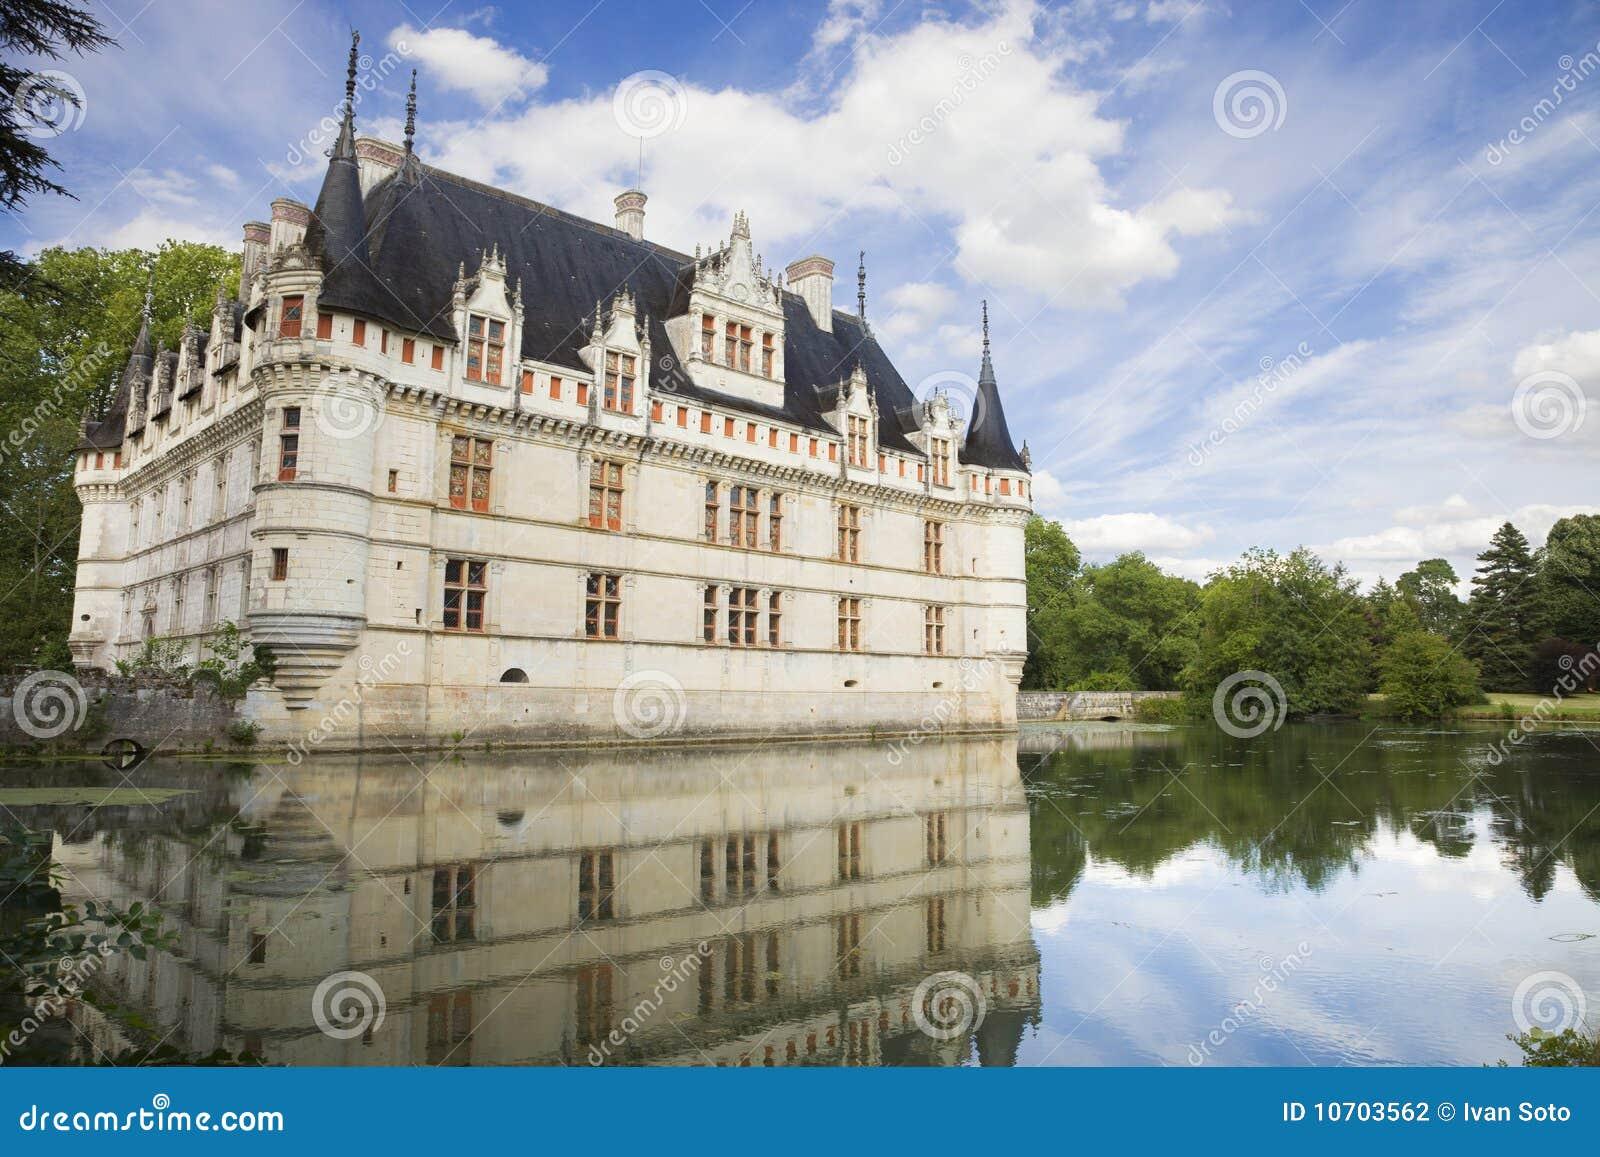 azay le rideau chateau france stock photography image 10703562. Black Bedroom Furniture Sets. Home Design Ideas